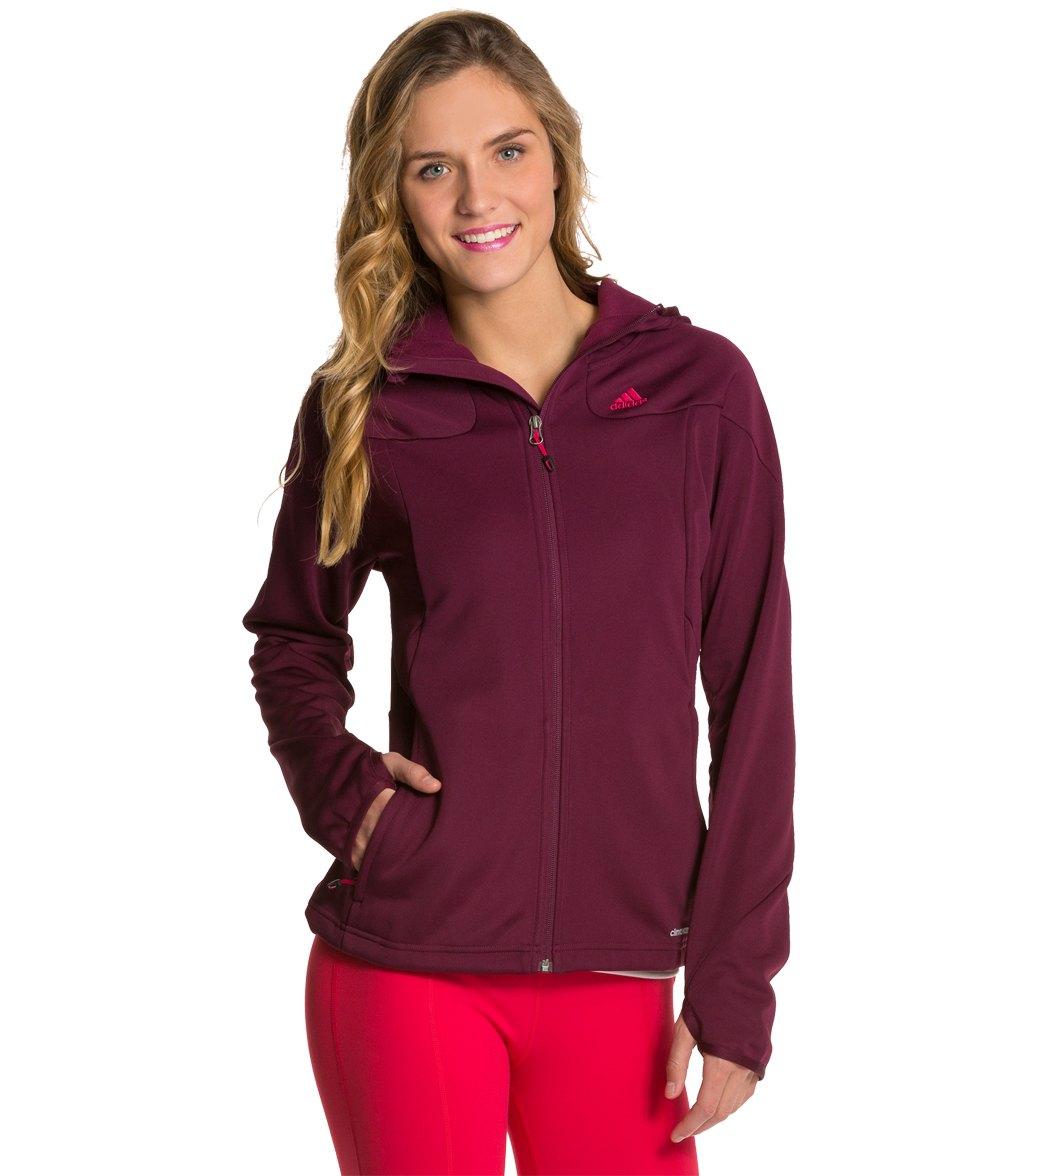 Adidas Women's Hiking 1 Side Fleece Running Hoodie - Amazon Red Xl - Swimoutlet.com